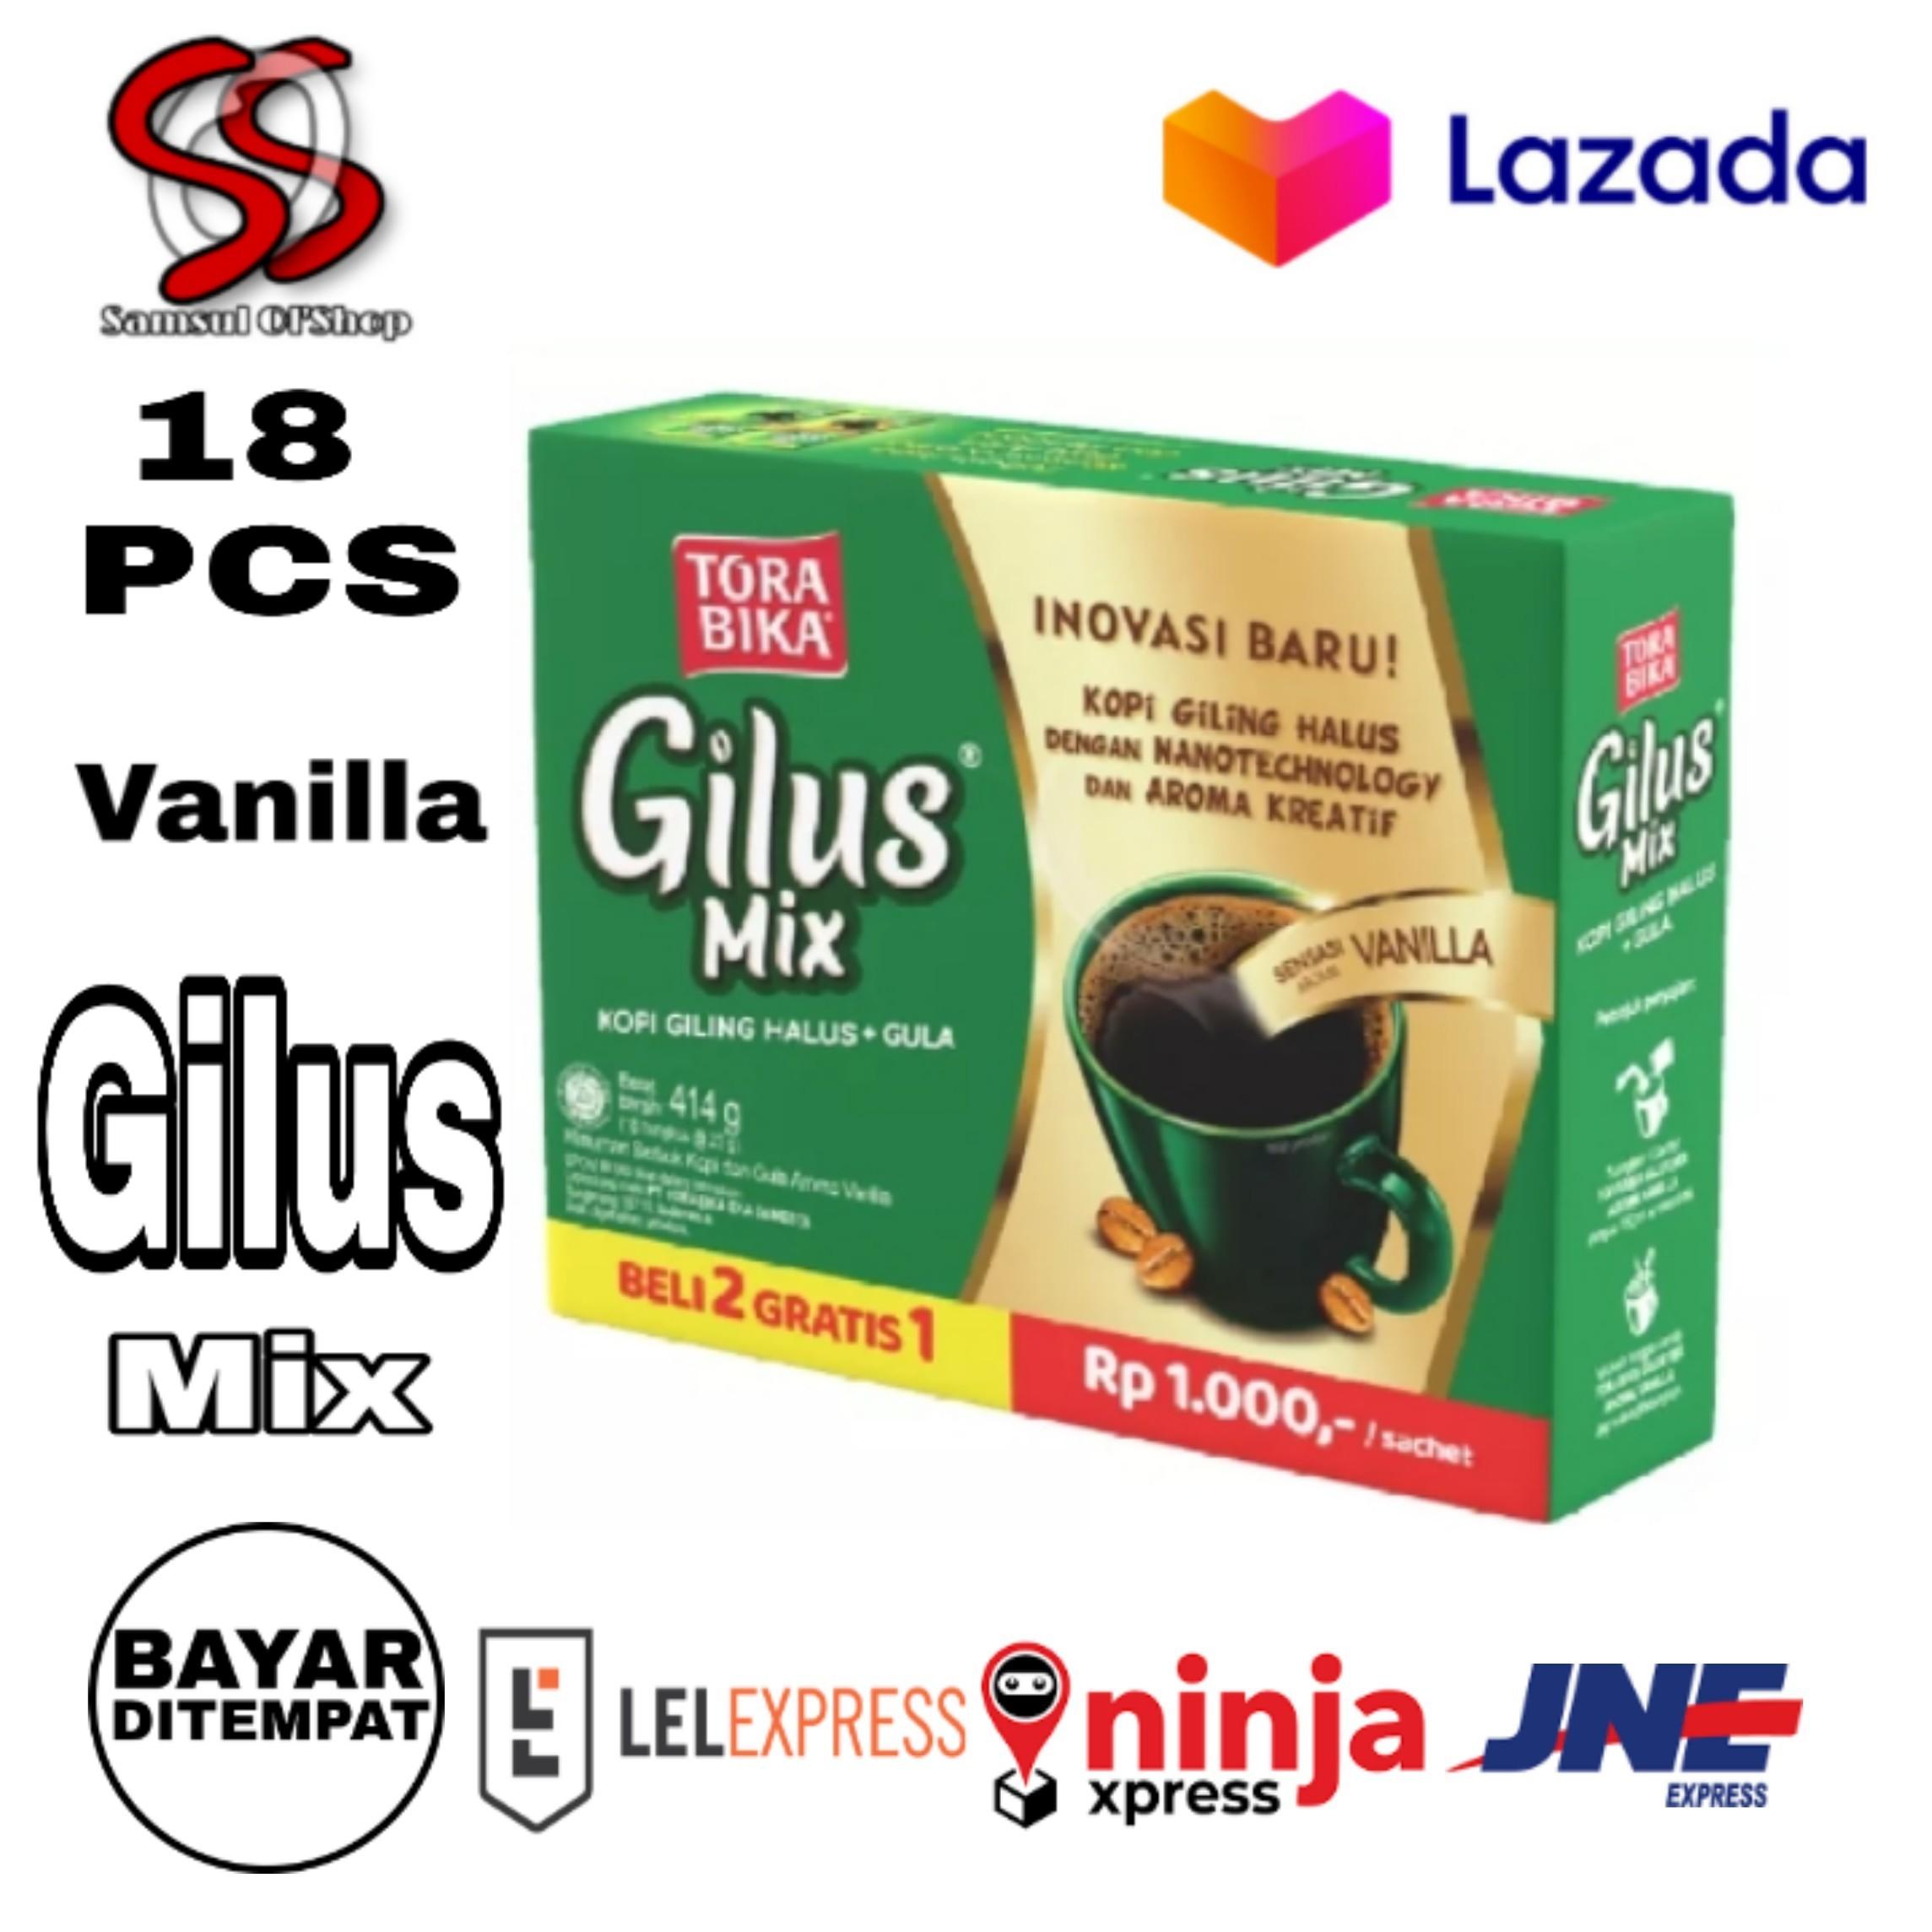 kopi gilus mix rasa vanilla torabika isi (18) pcs / gilus mix vanilla kopi torabika 18 sahcet